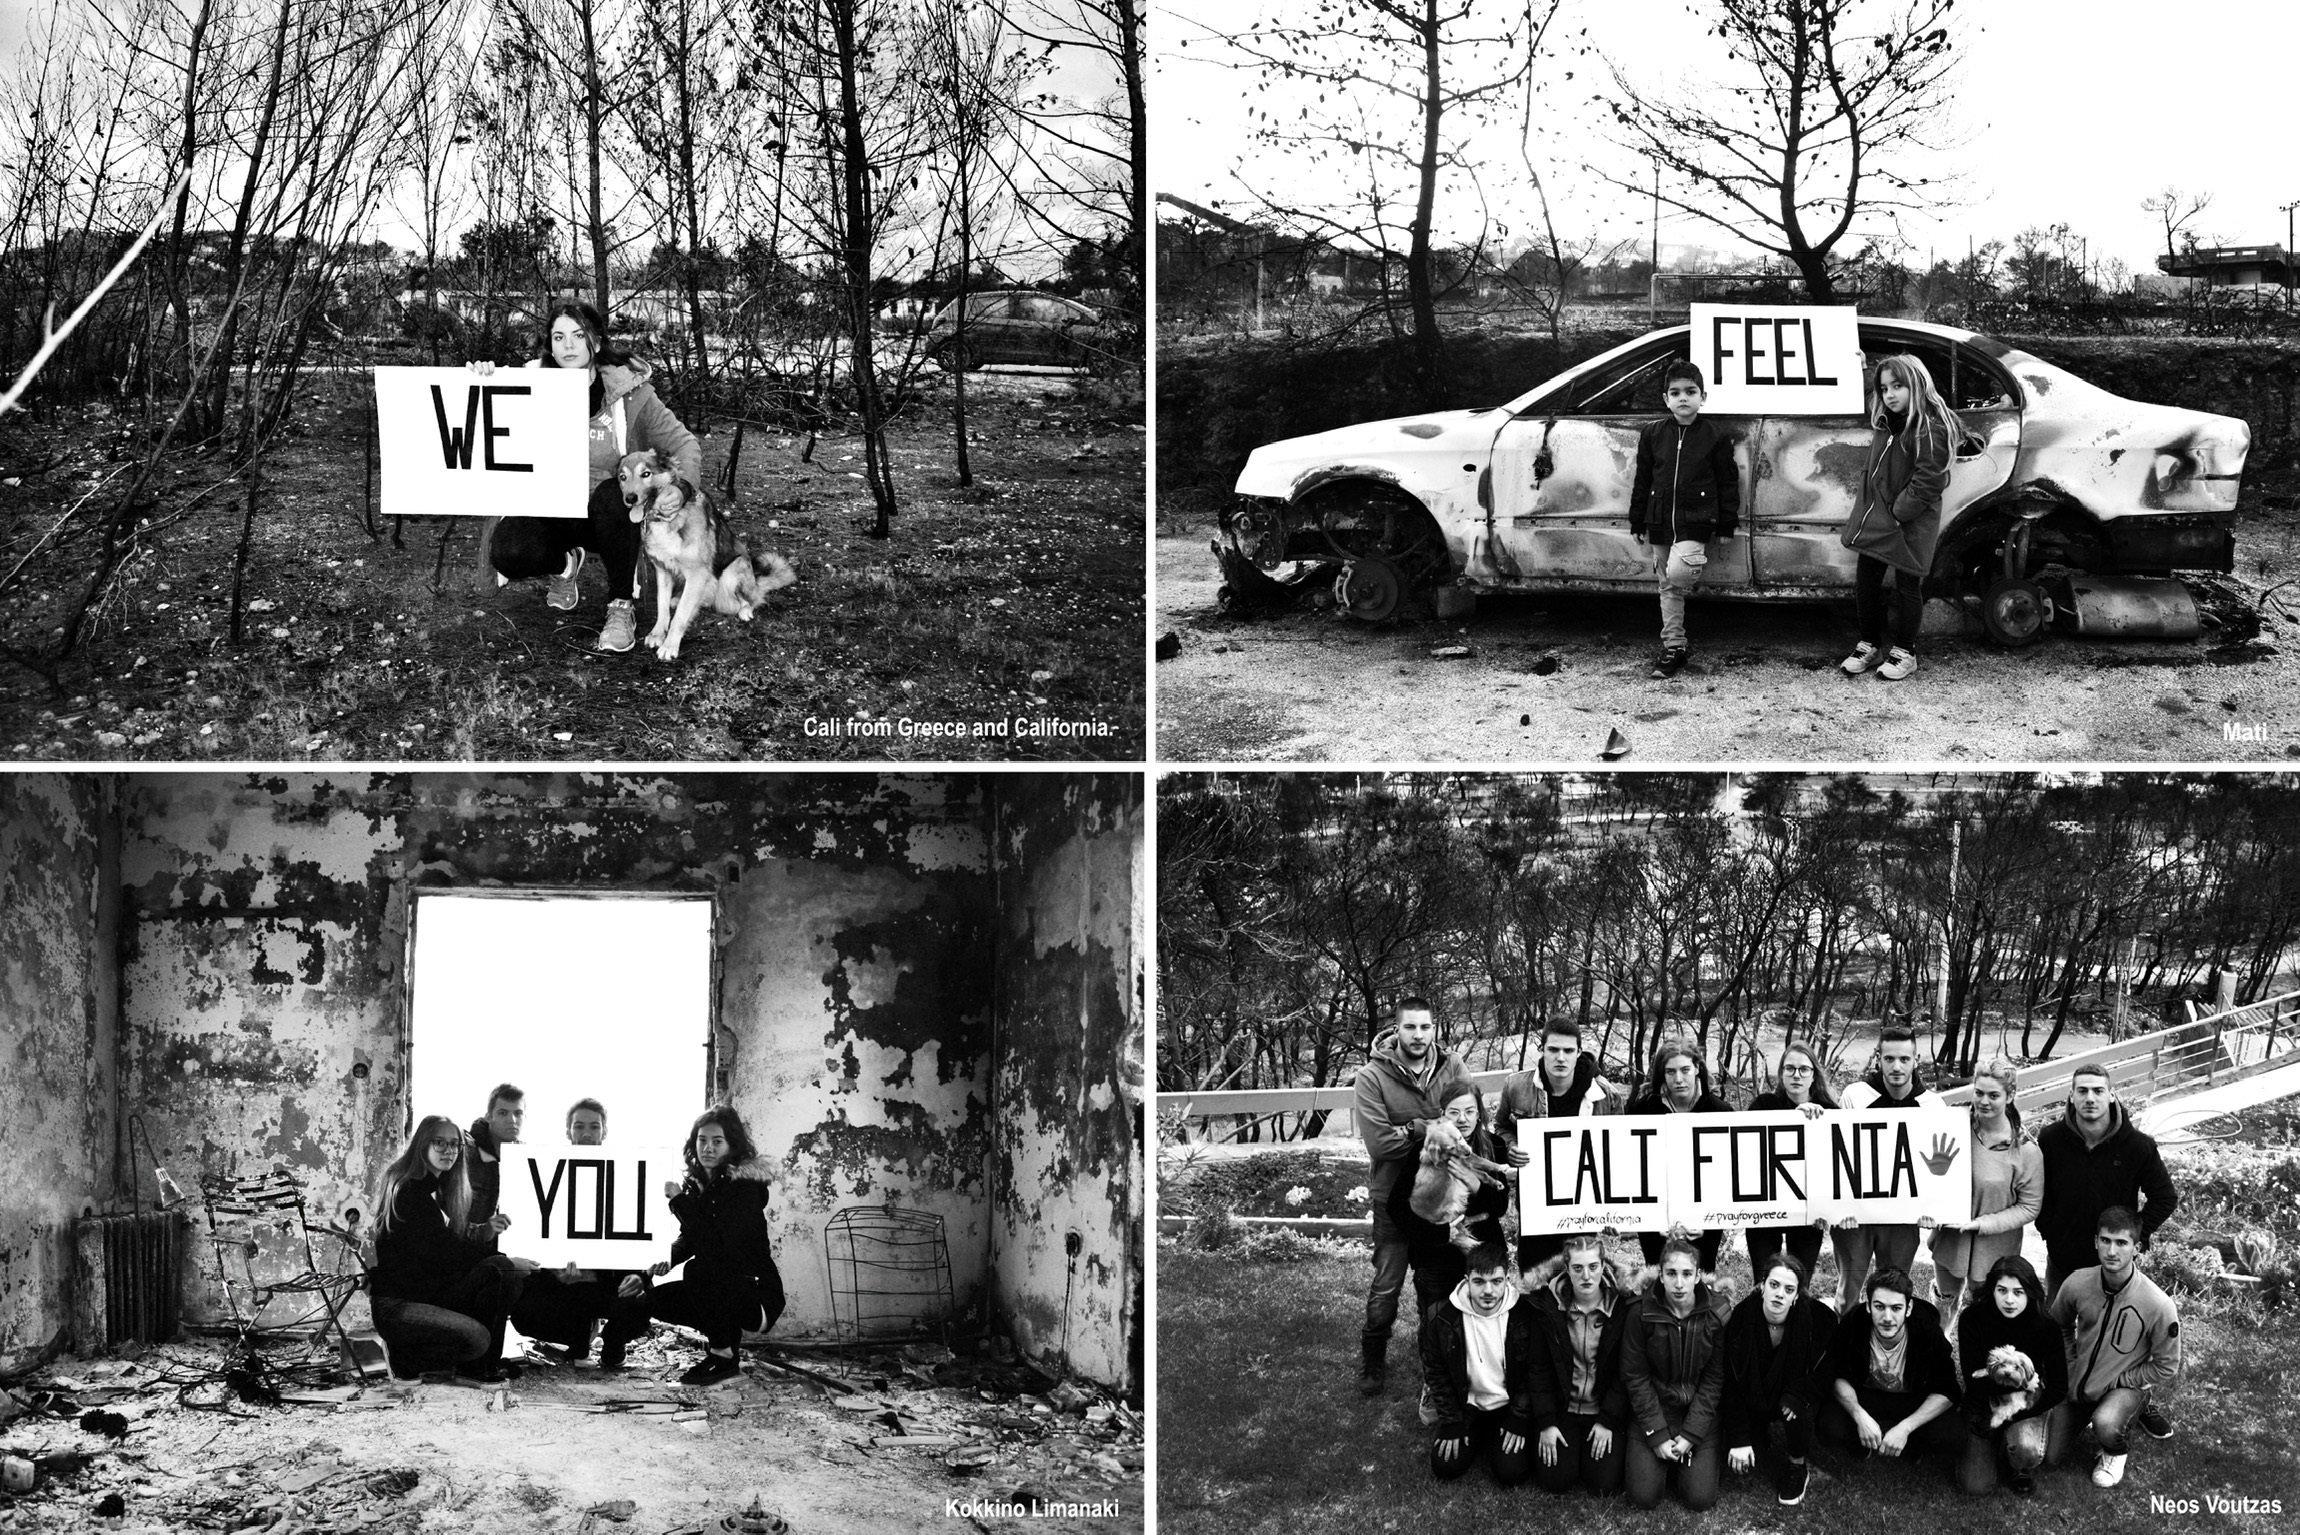 «We feel you California» - Νέοι από το Μάτι στέλνουν μήνυμα στους πυρόπληκτους στην Καλιφόρνια και συγκινούν τον αμερικανό